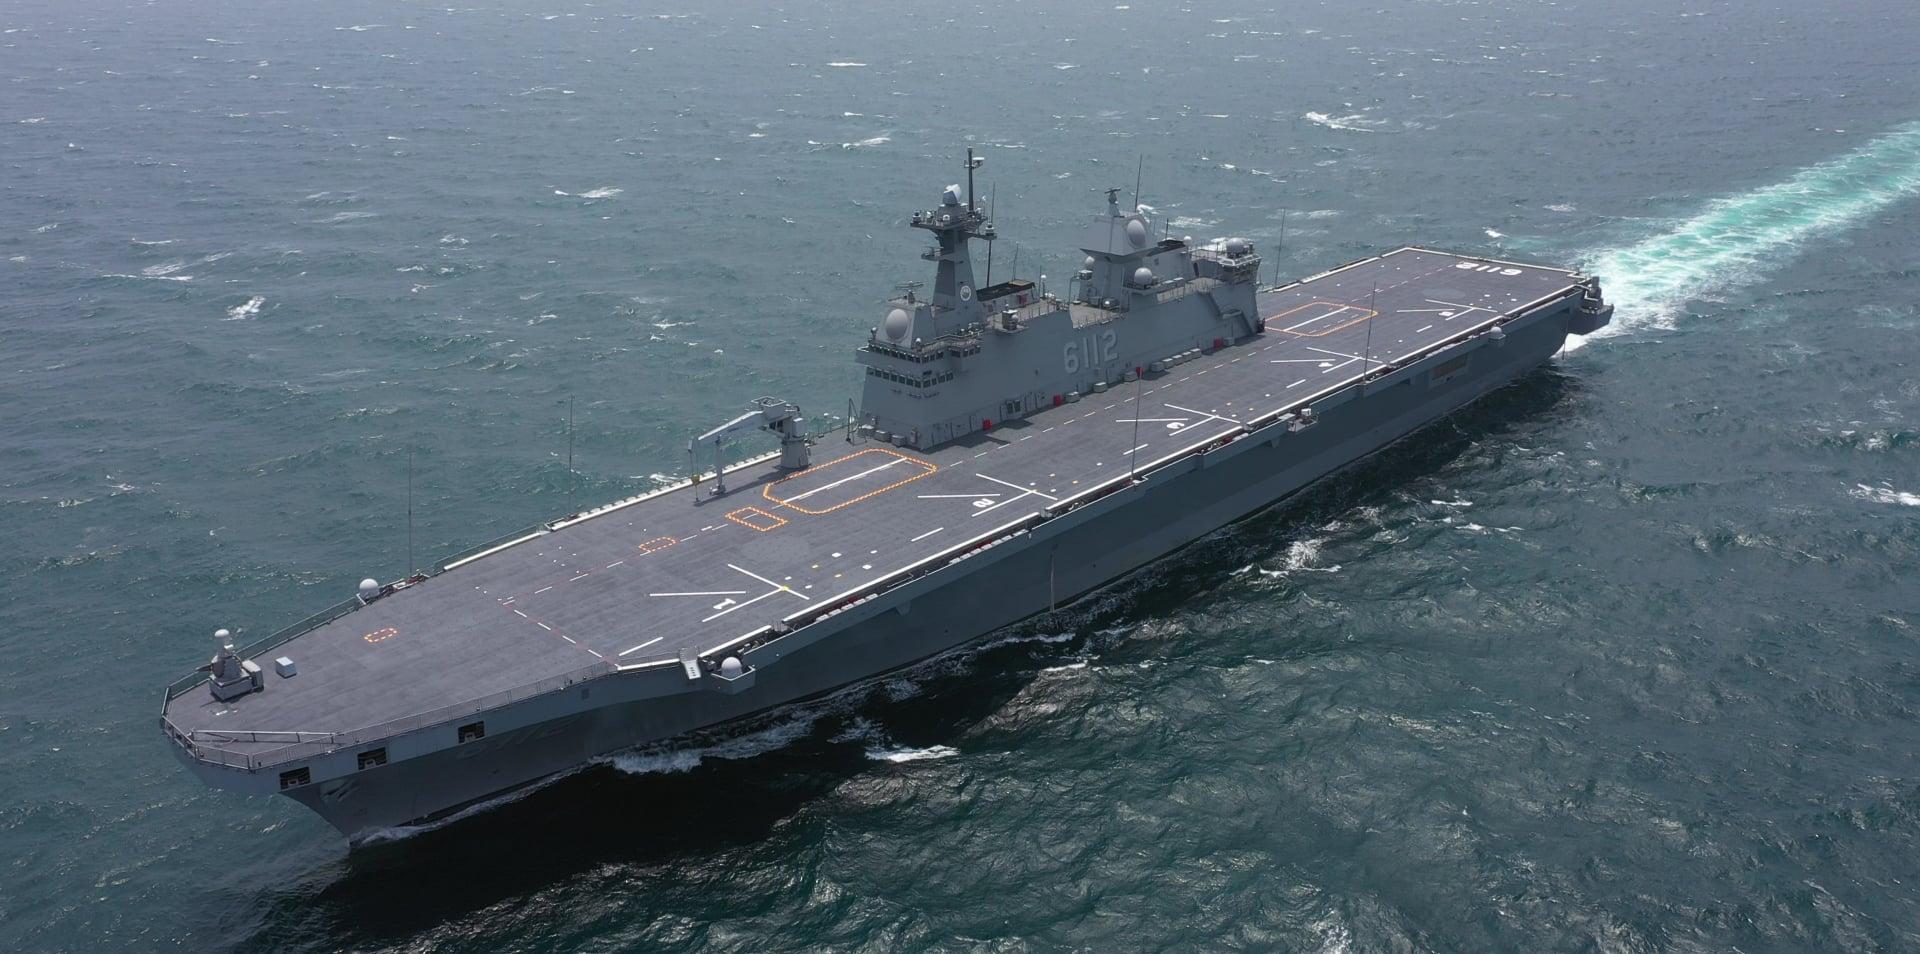 Republic of Korea Navy ROKS Marado (LPH-6112) Amphibious Assault Ship